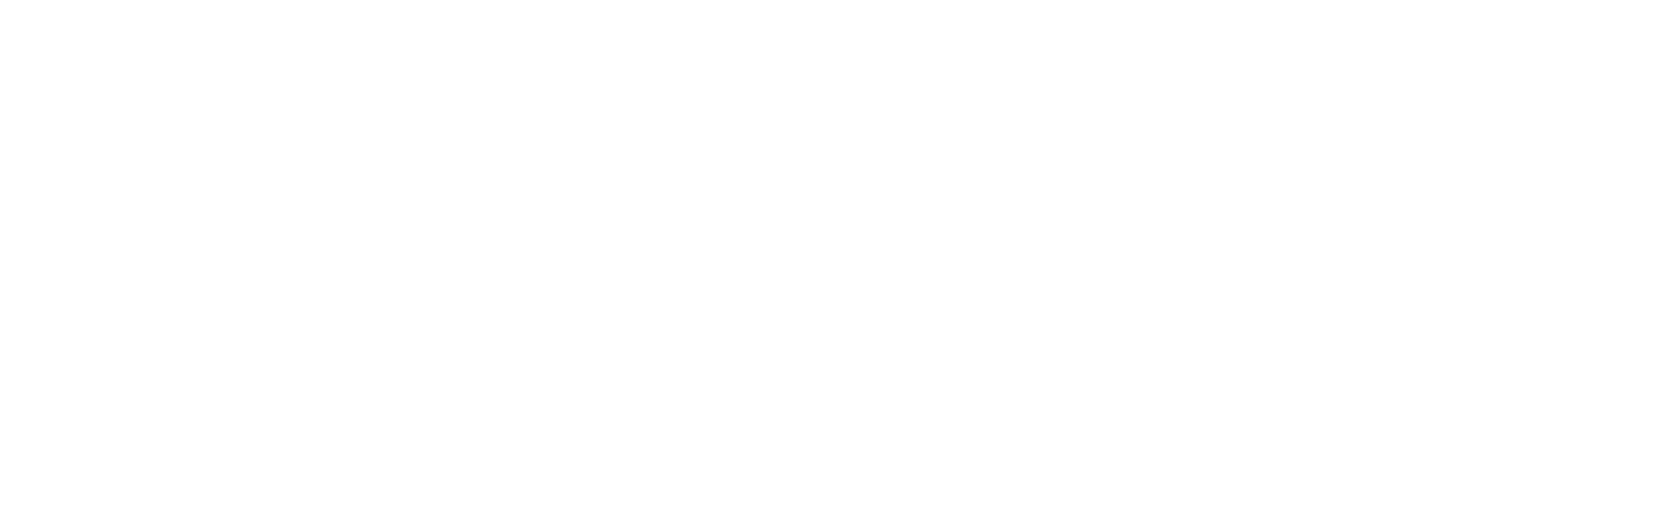 The Bowen logo in white